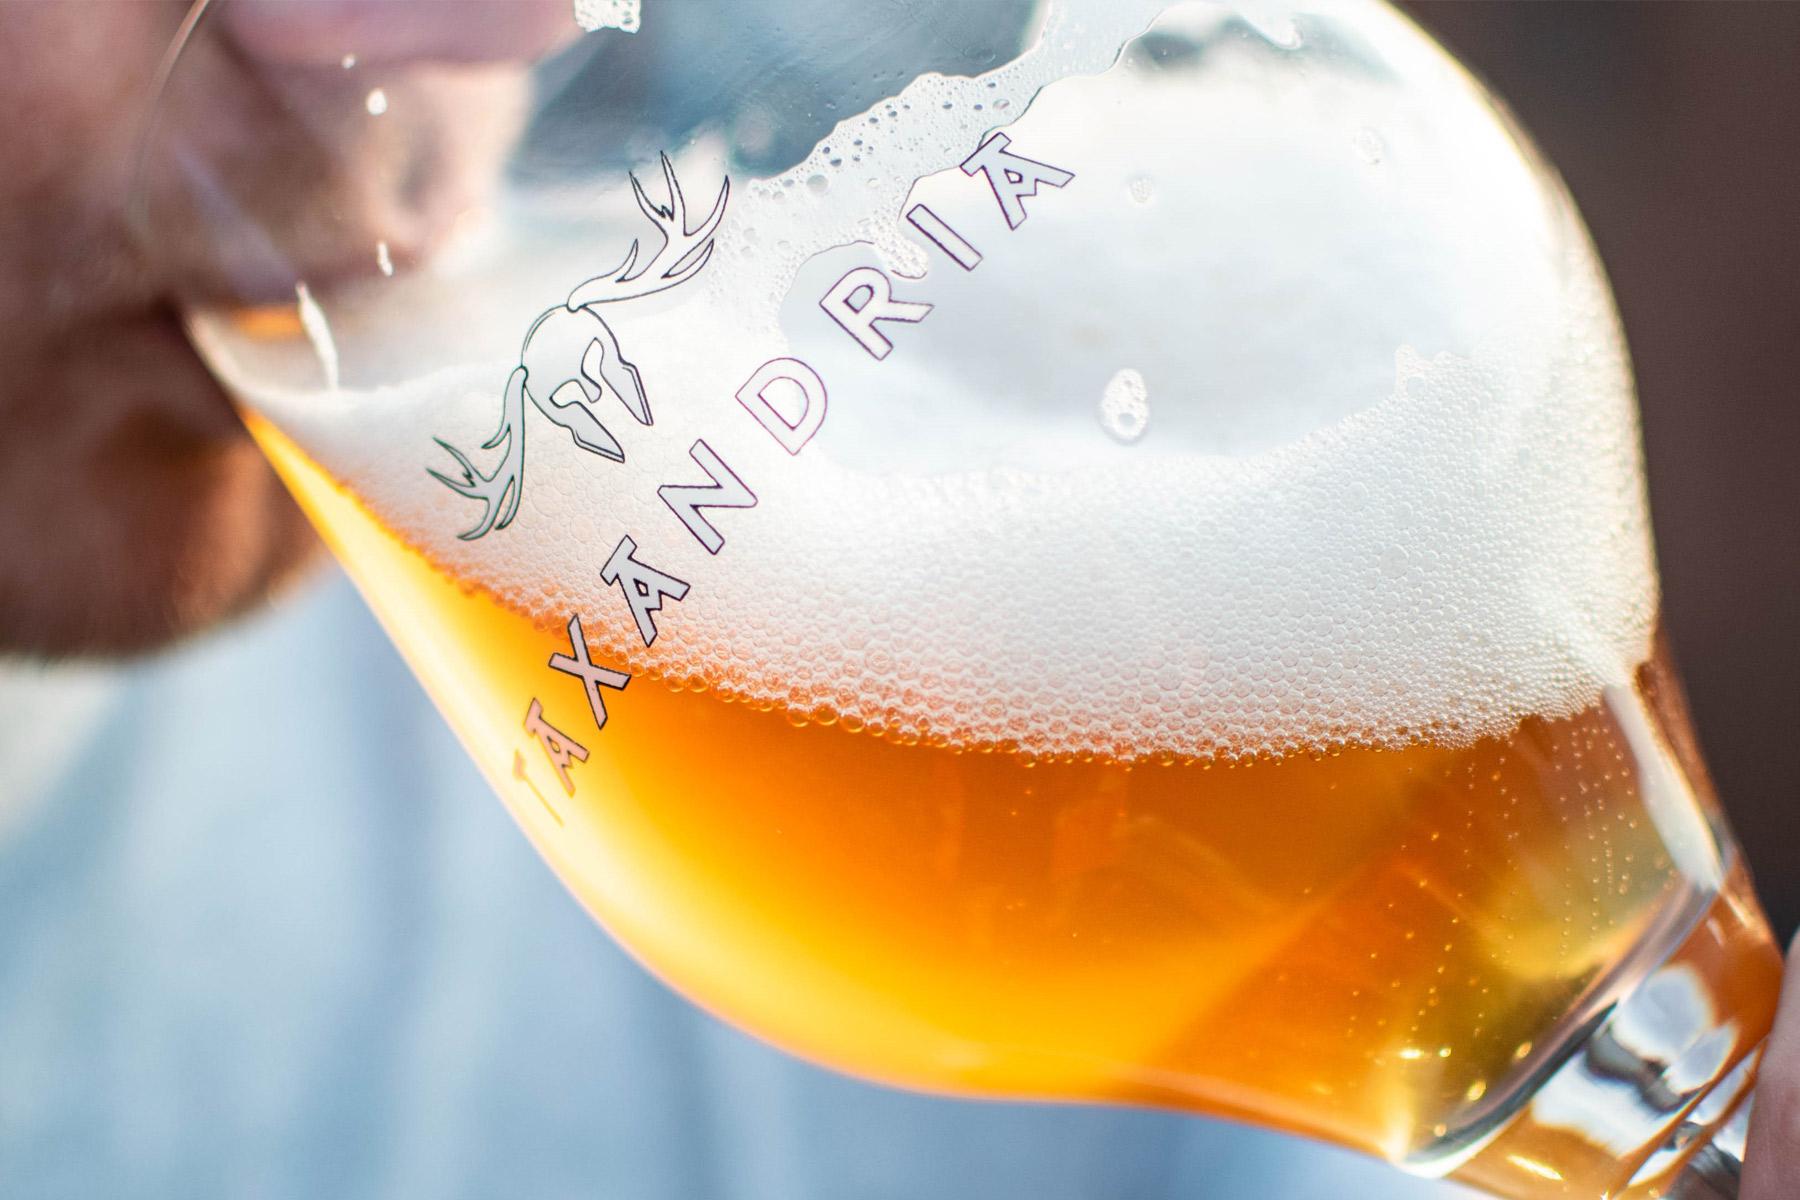 taxandria-bier-glas-1800×1200